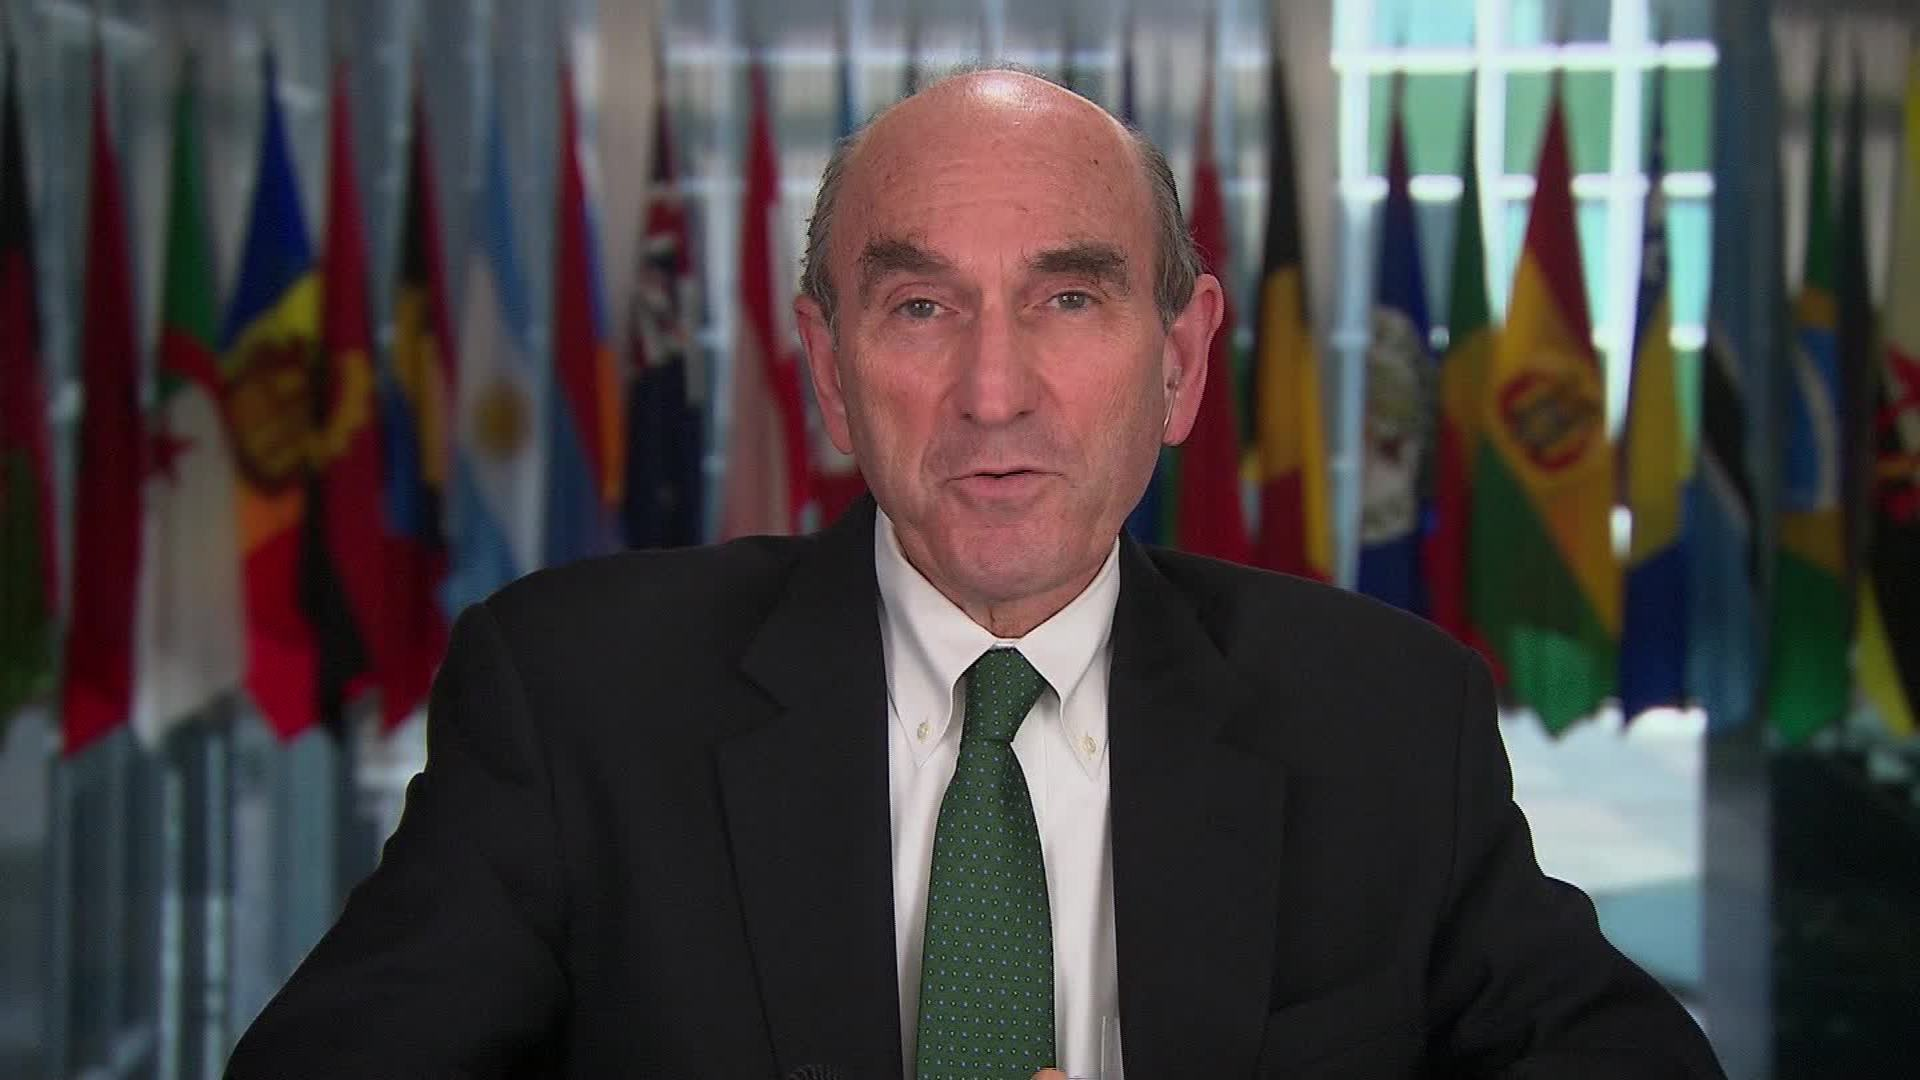 Abrams: Pressure on Iran 'will increase' - CNN Video